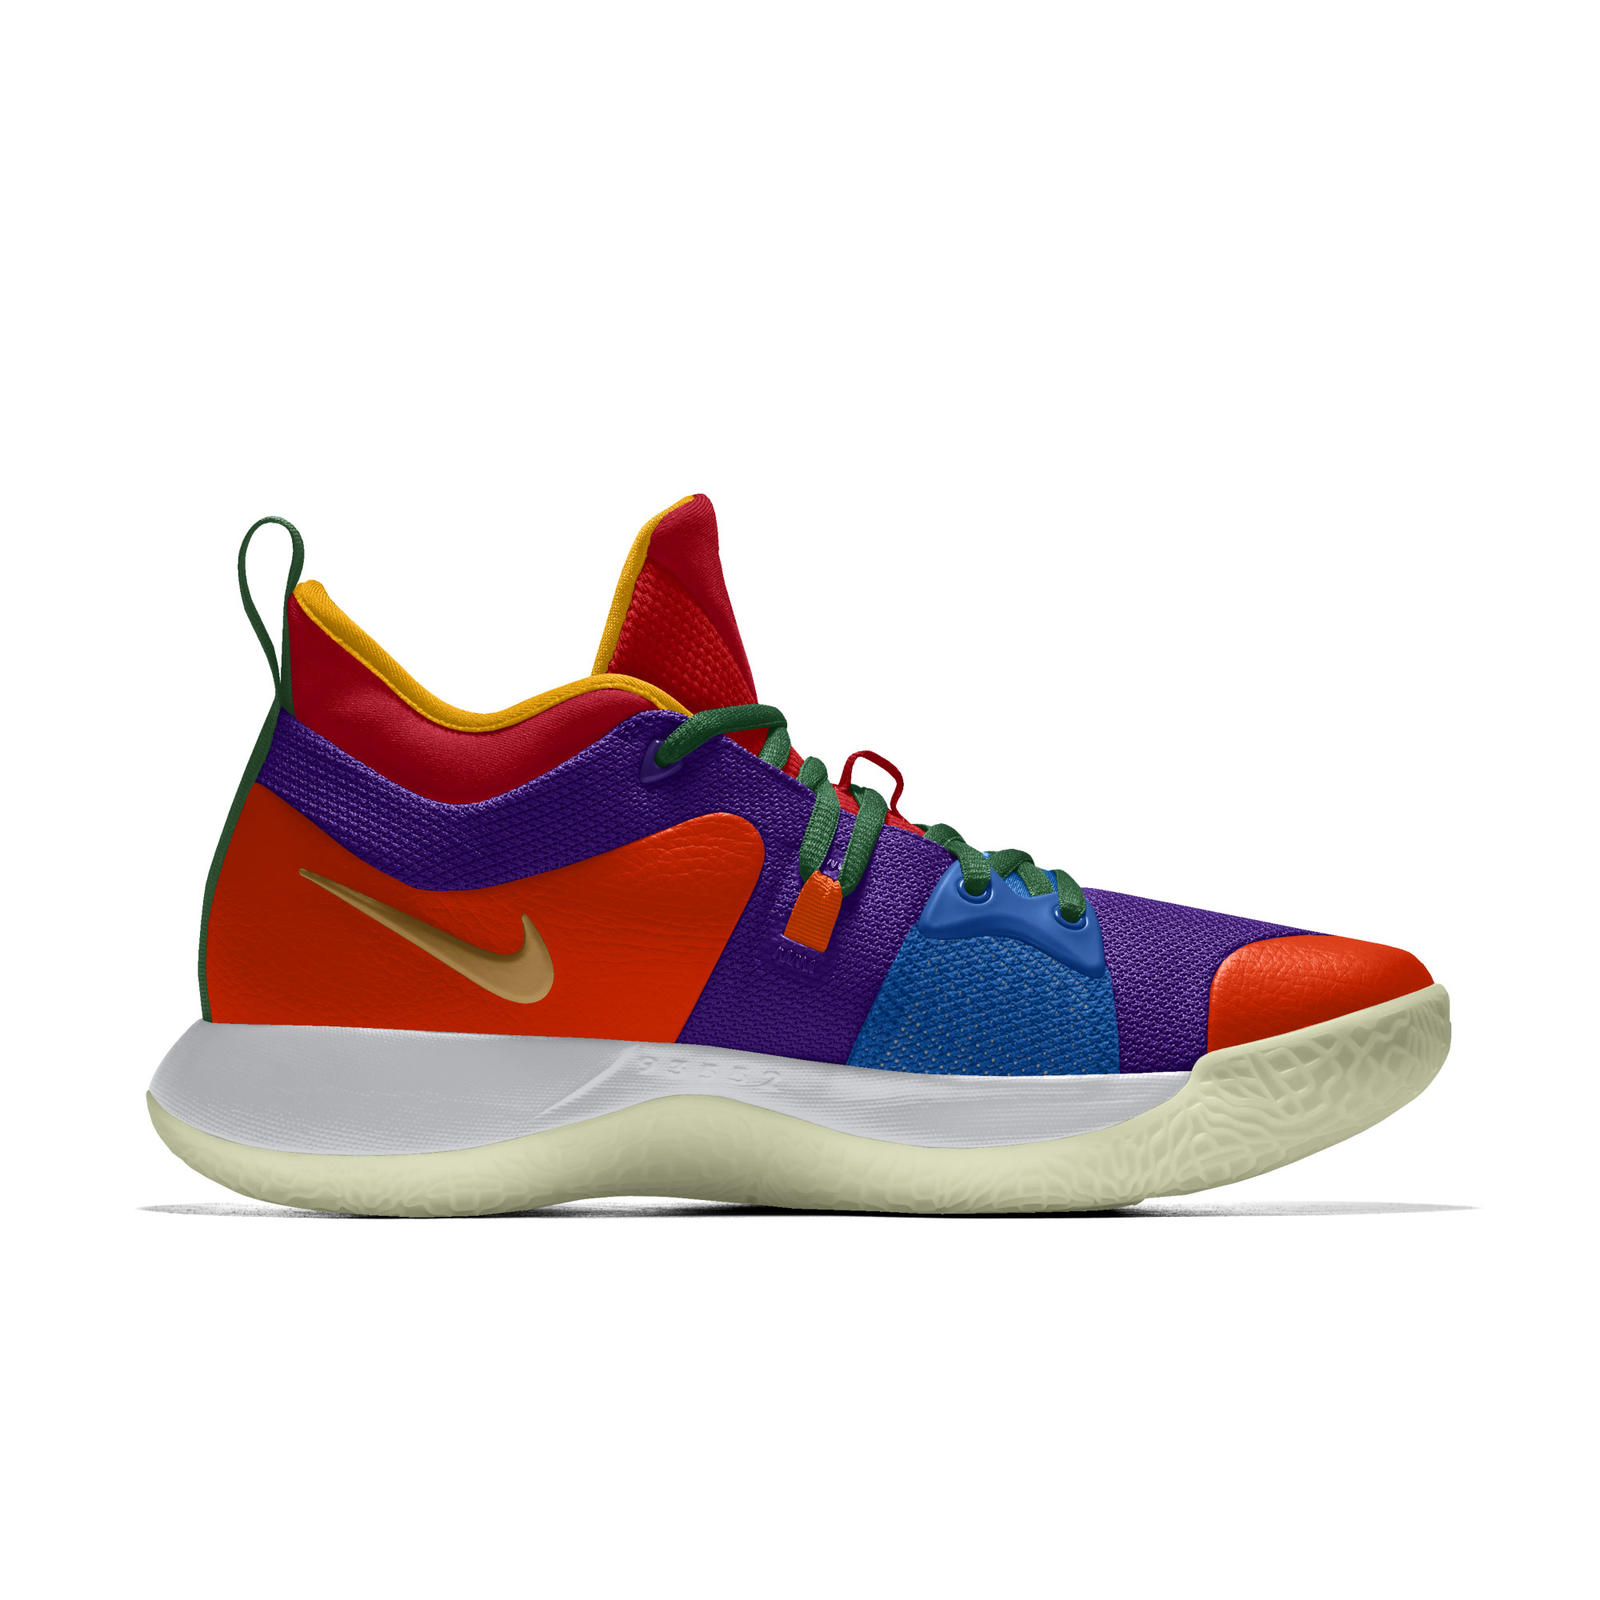 d7dce6630d126 2018 Nike x NBA Opening Week Player Edition NikeID – SoleGRIND